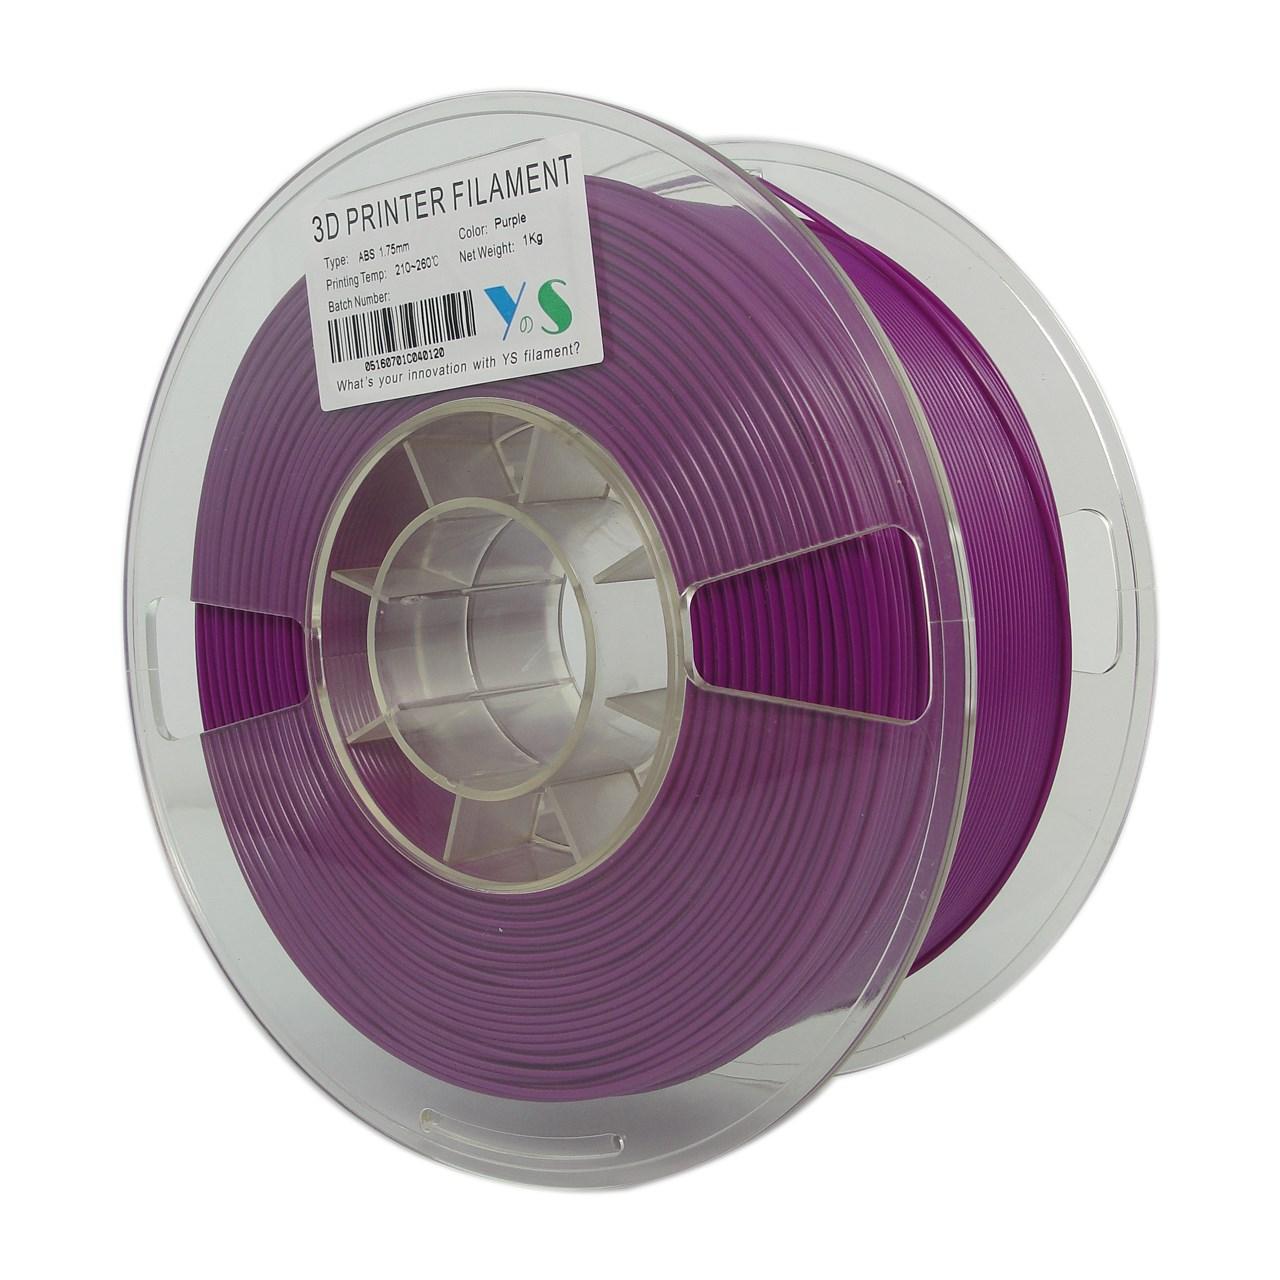 فیلامنت پرینتر سه بعدی ABS  یوسو  بنفش 1.75 میلیمتر  1 کیلو